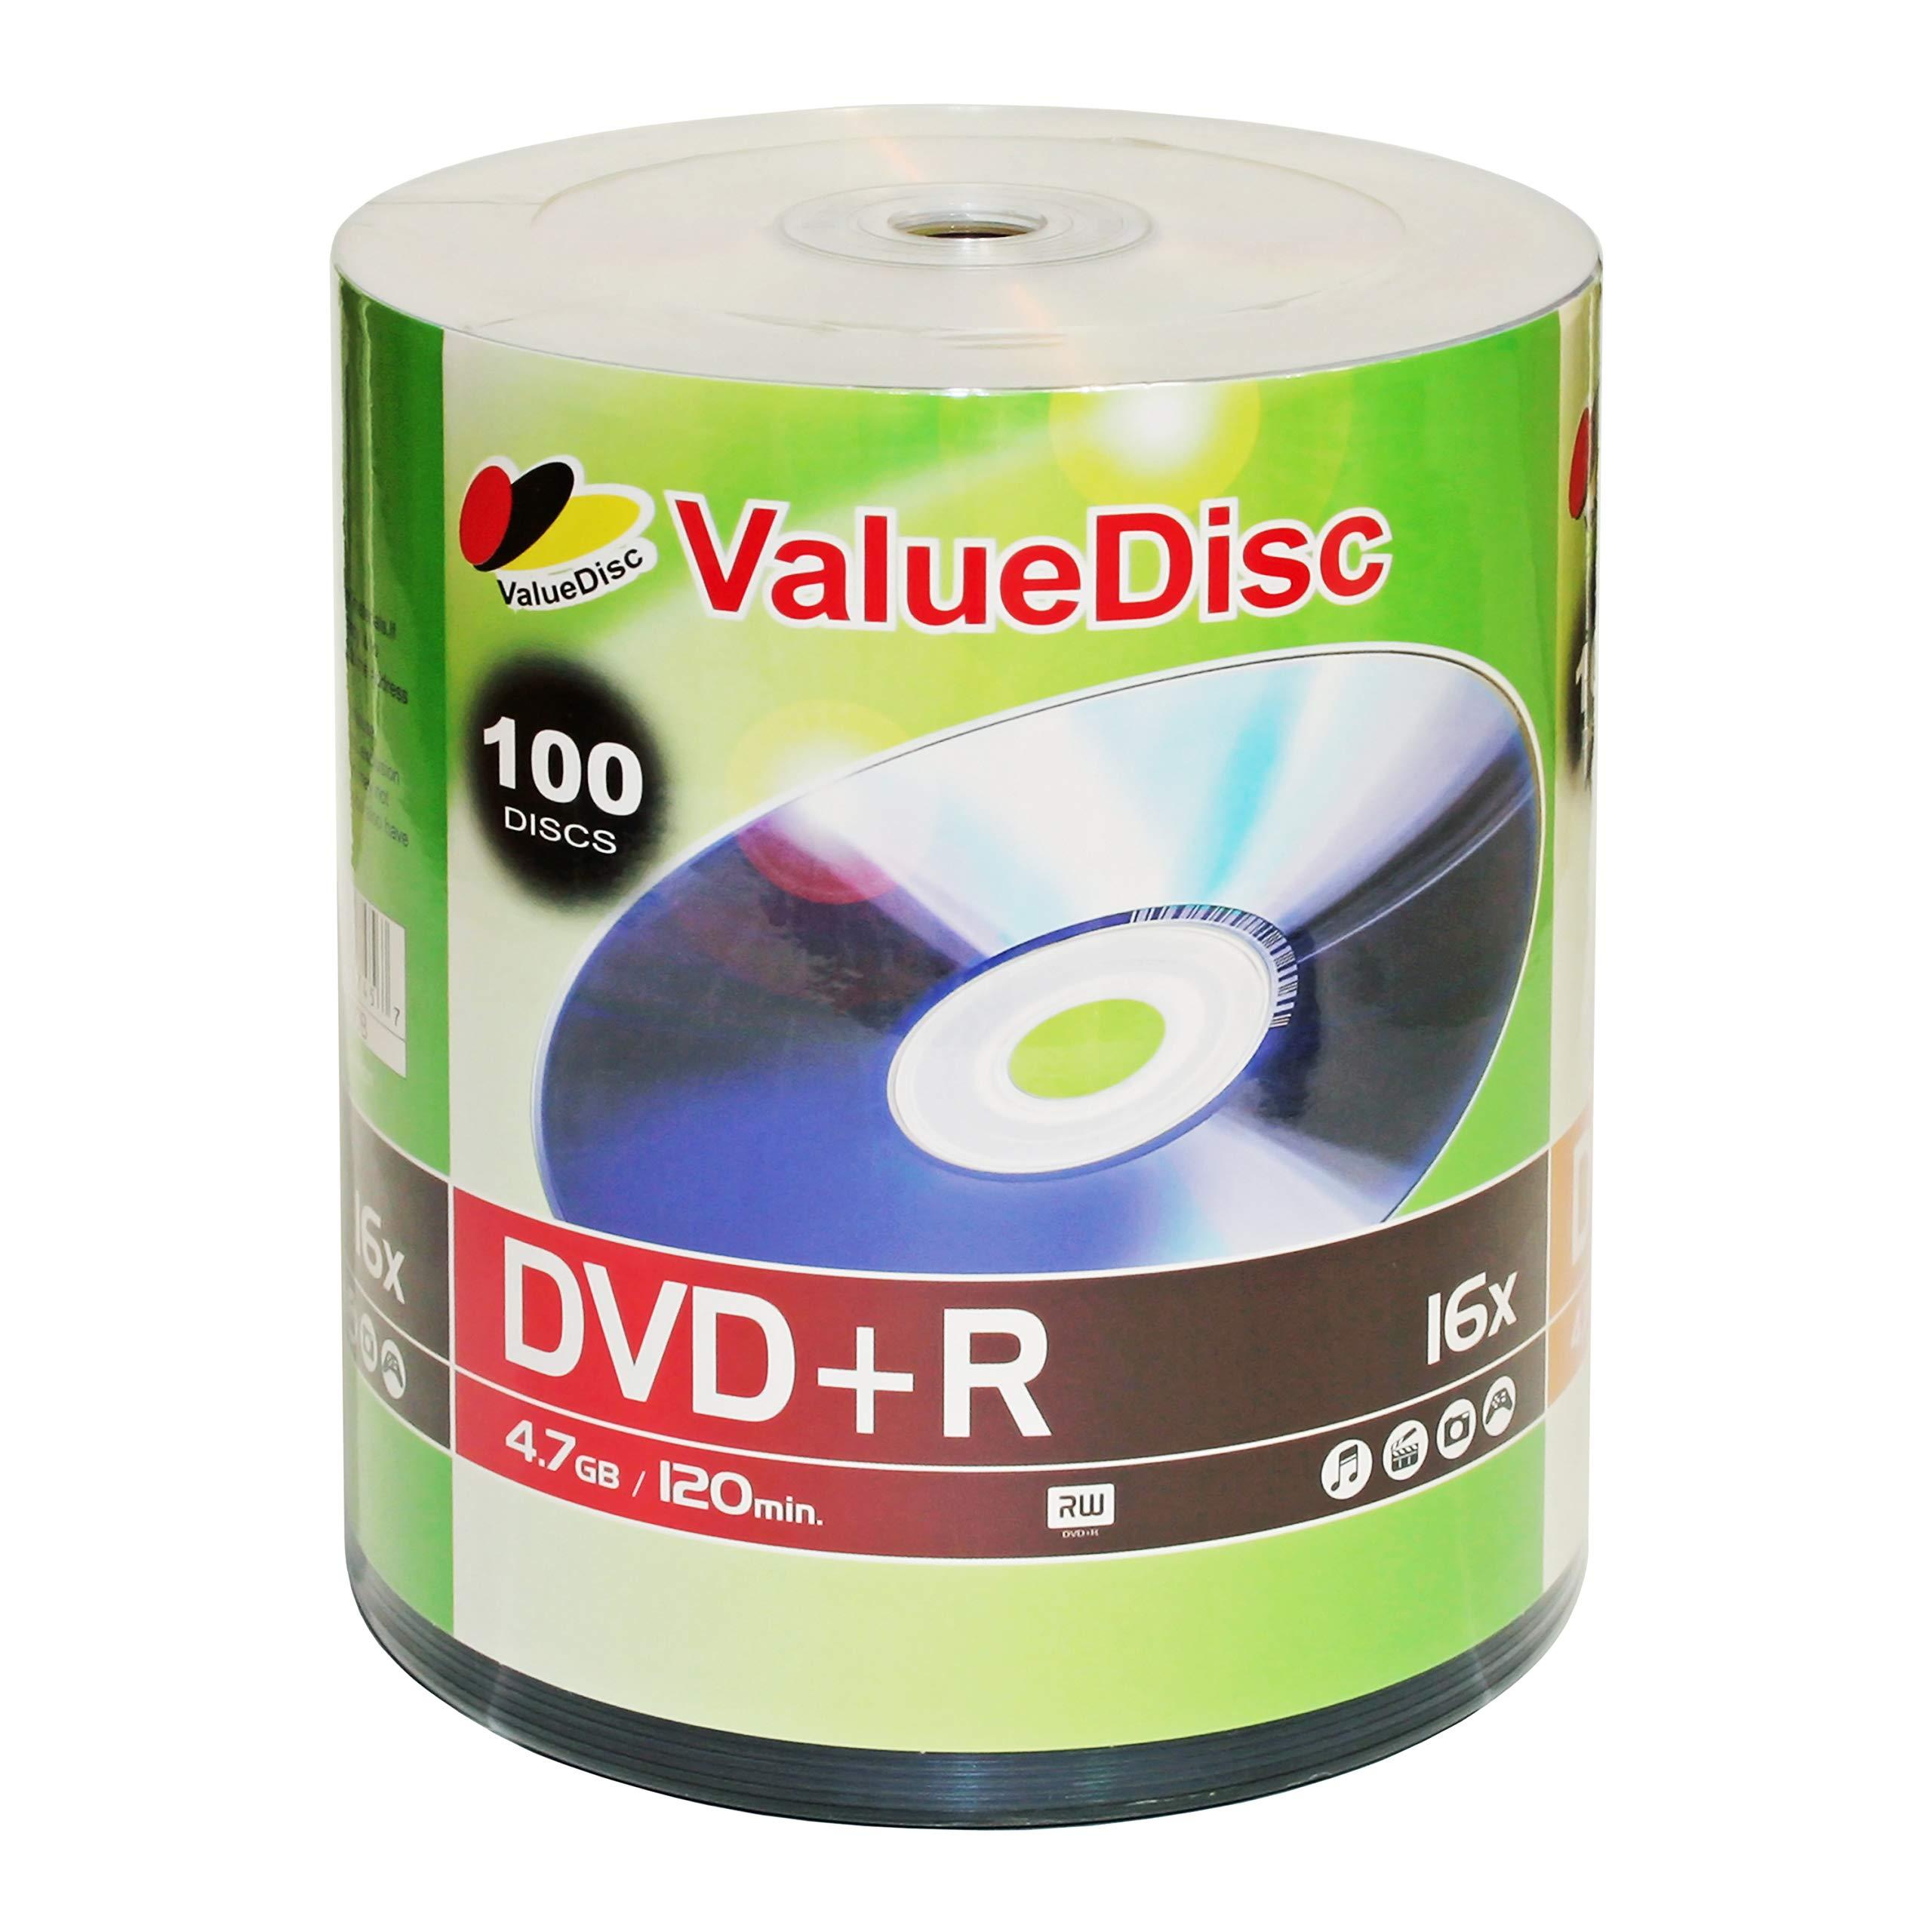 ValueDisc,DVD+R 16x 4.7GB/120 Minute Disc 100-Pack